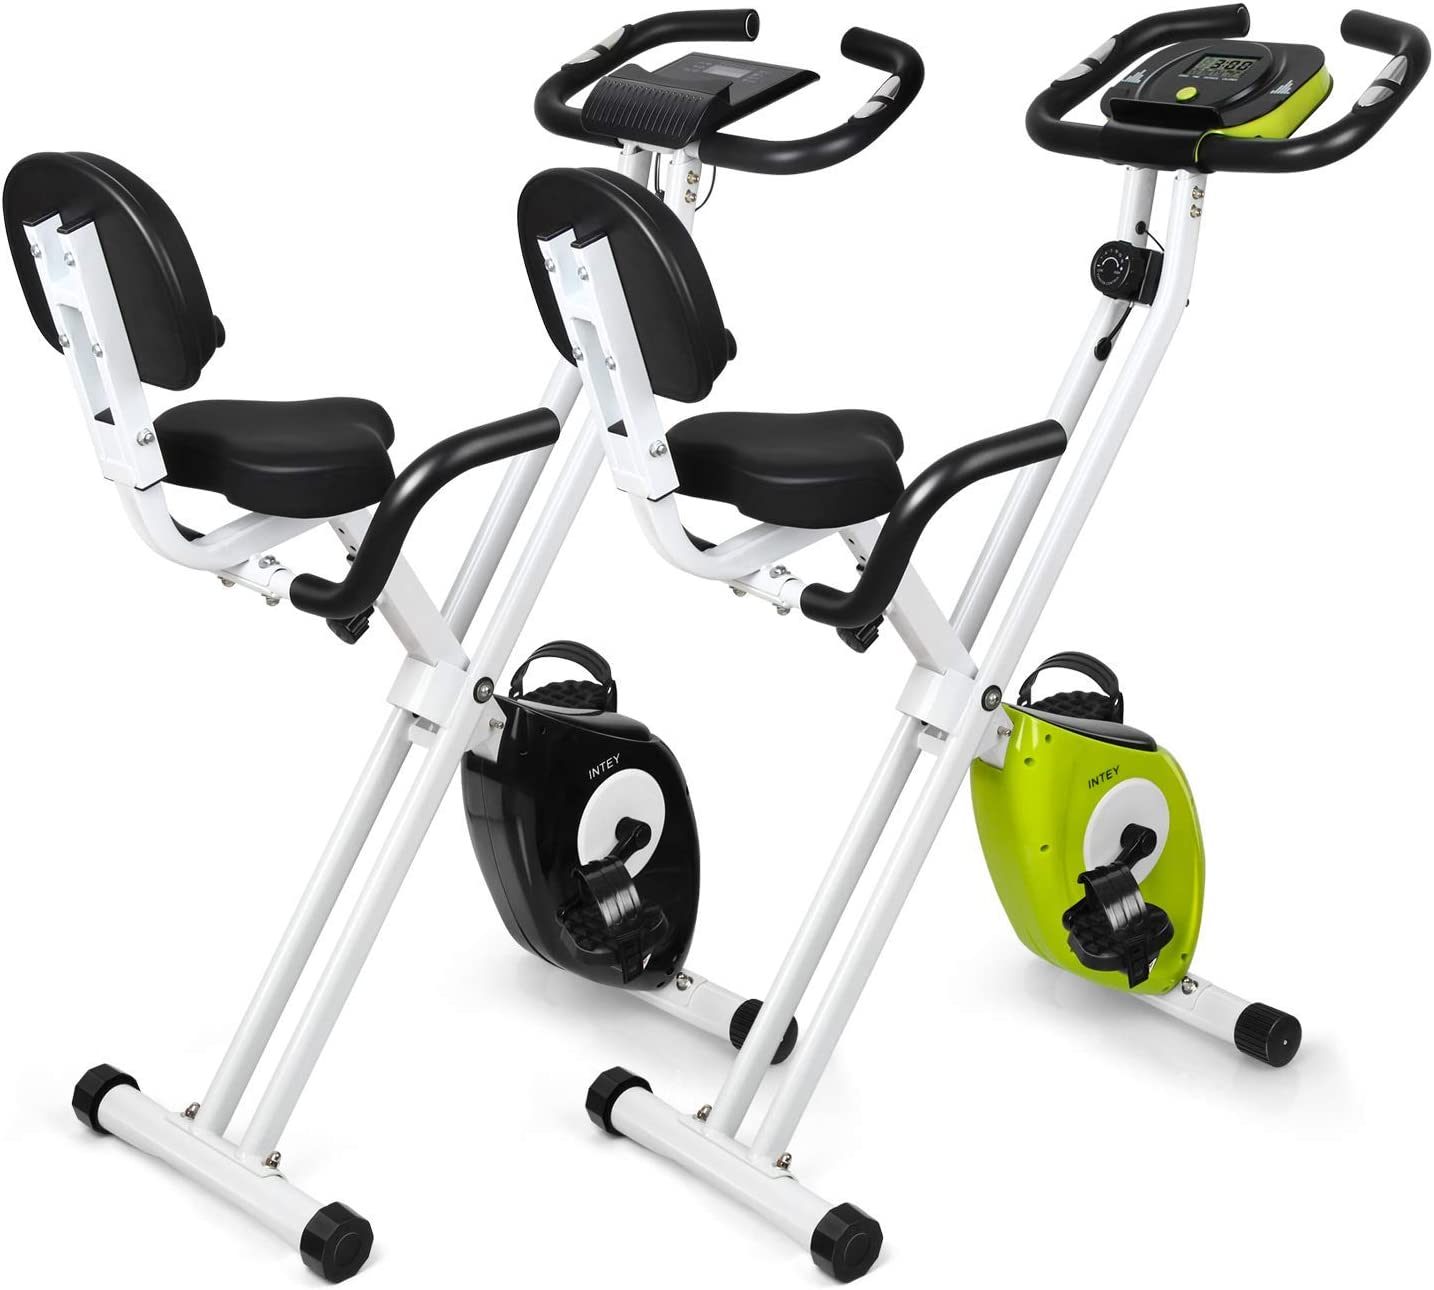 INTEY Bicicleta Ejercicios Magnética Plegable con 16 Niveles de ...